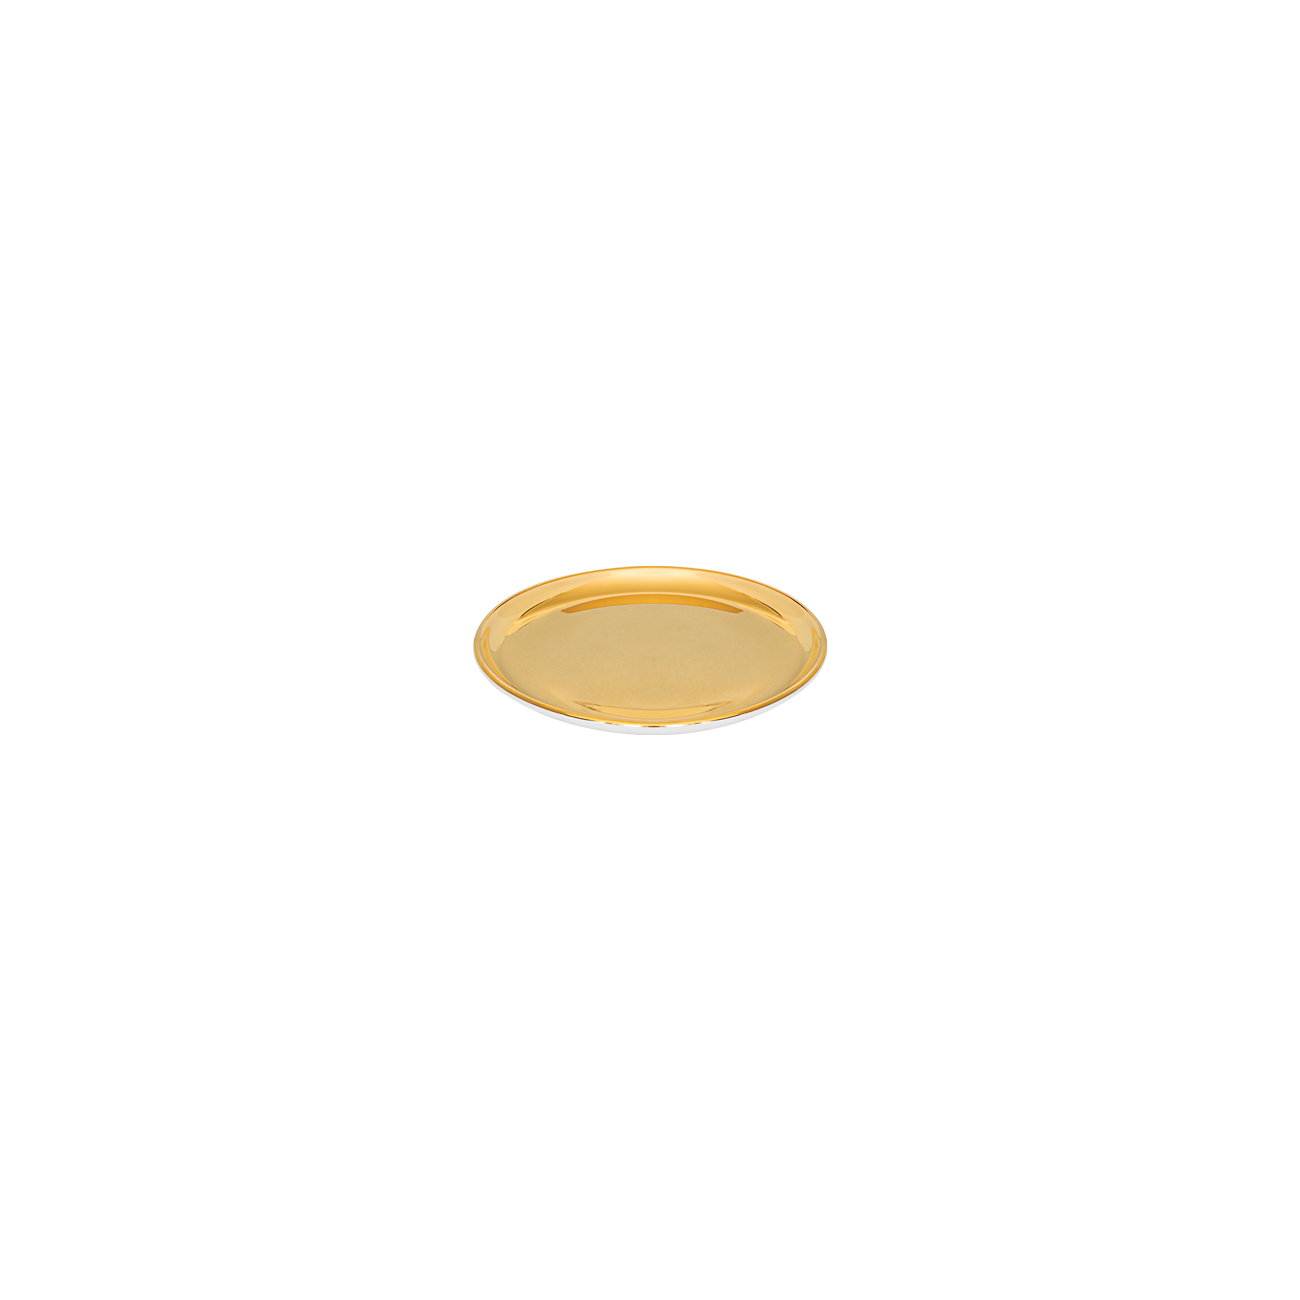 Full Gold | Drink Coaster 11cm 0